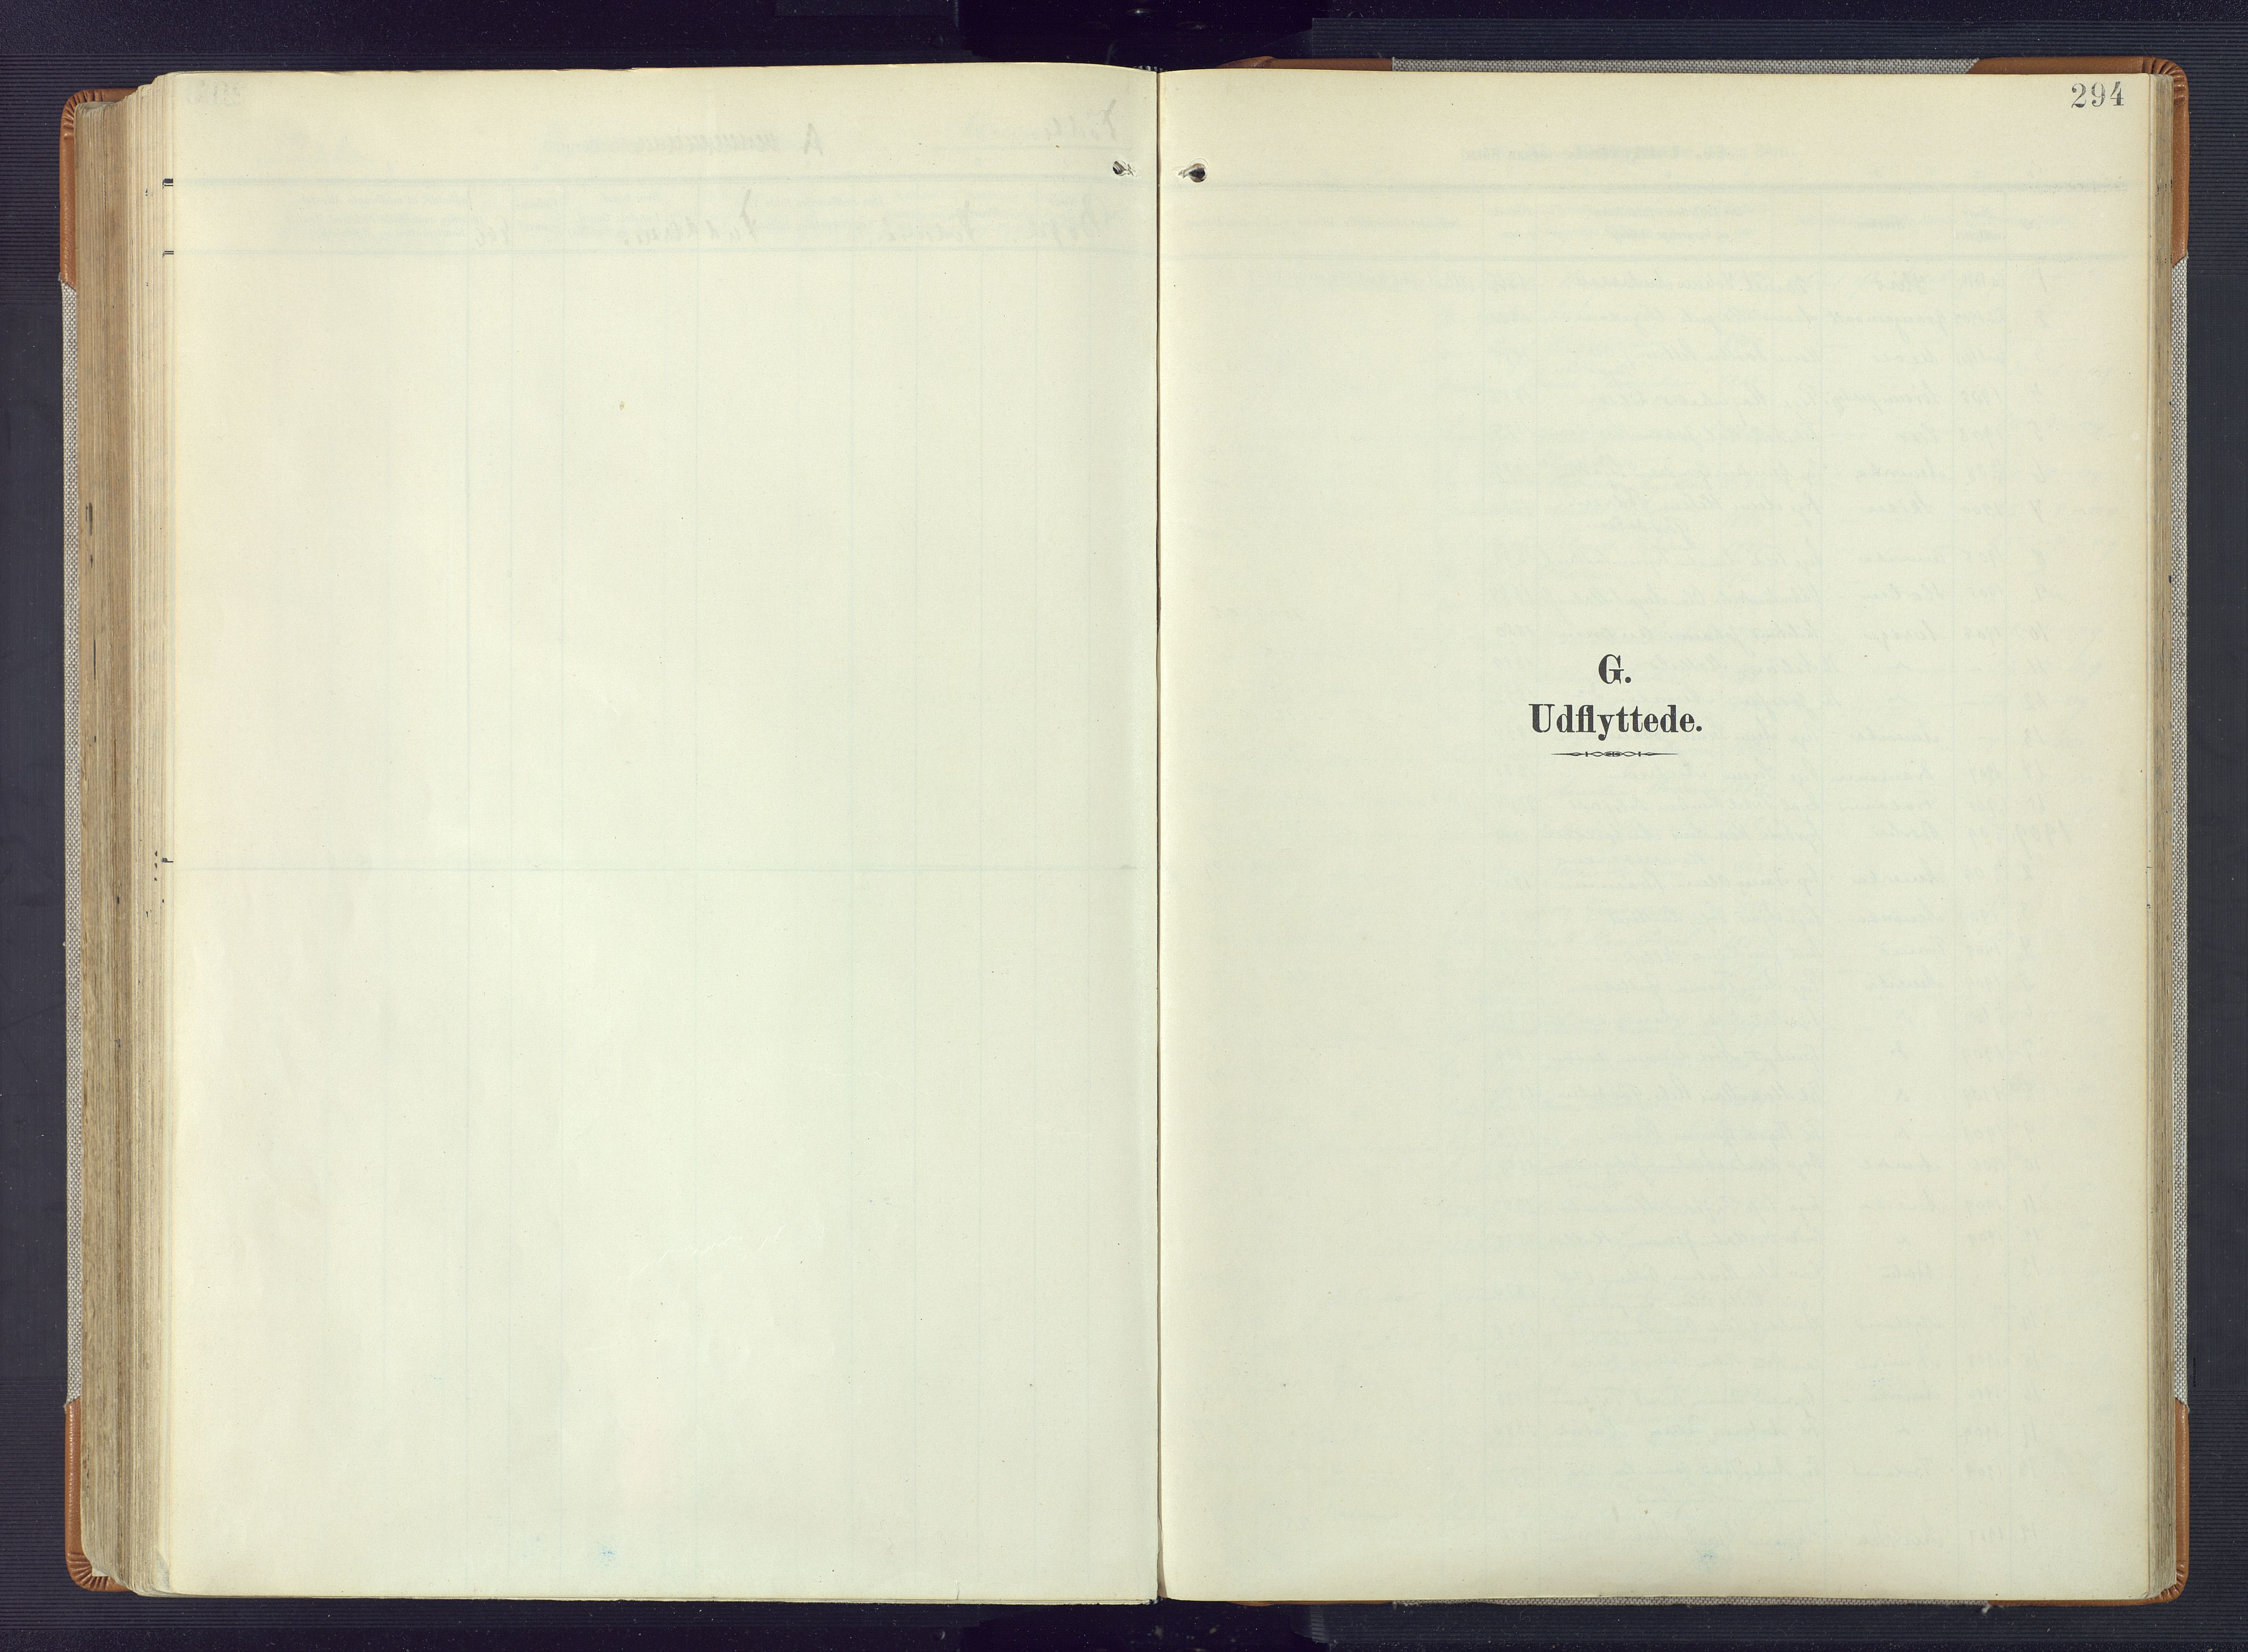 SAK, Øyestad sokneprestkontor, F/Fa/L0019: Ministerialbok nr. A 19, 1908-1922, s. 294